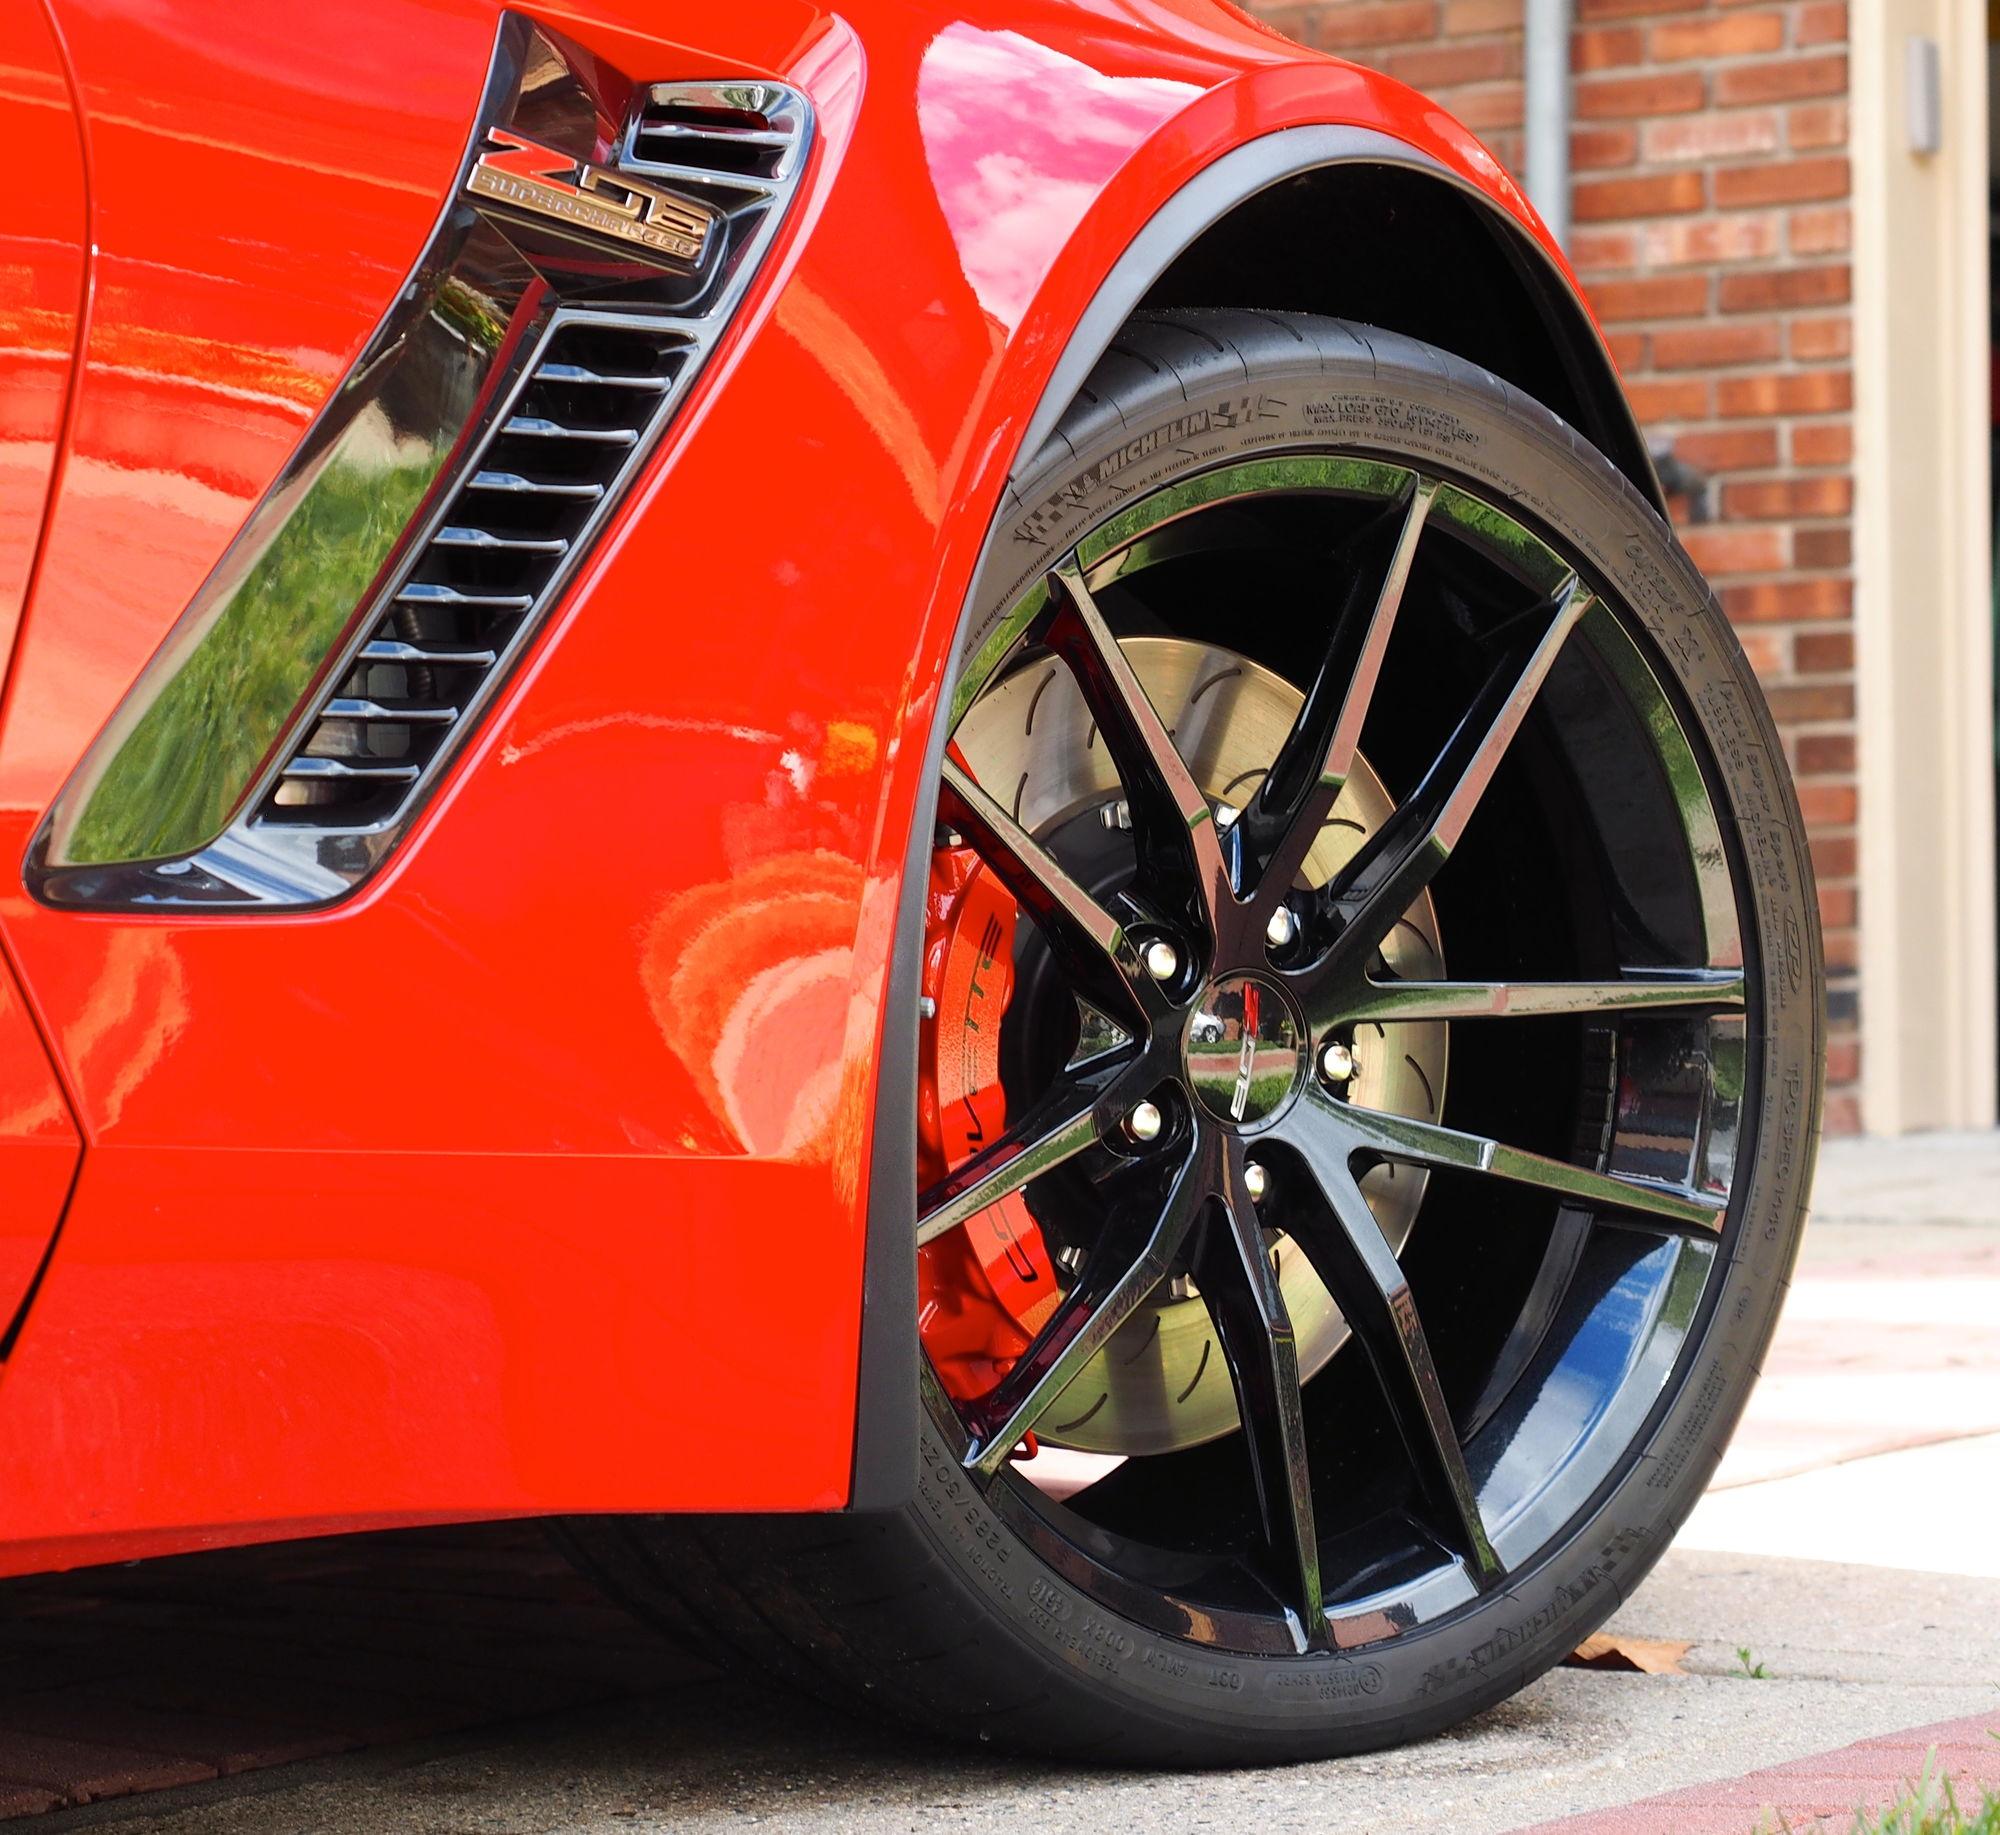 z06  z07 owners looking for street wheel  tire package